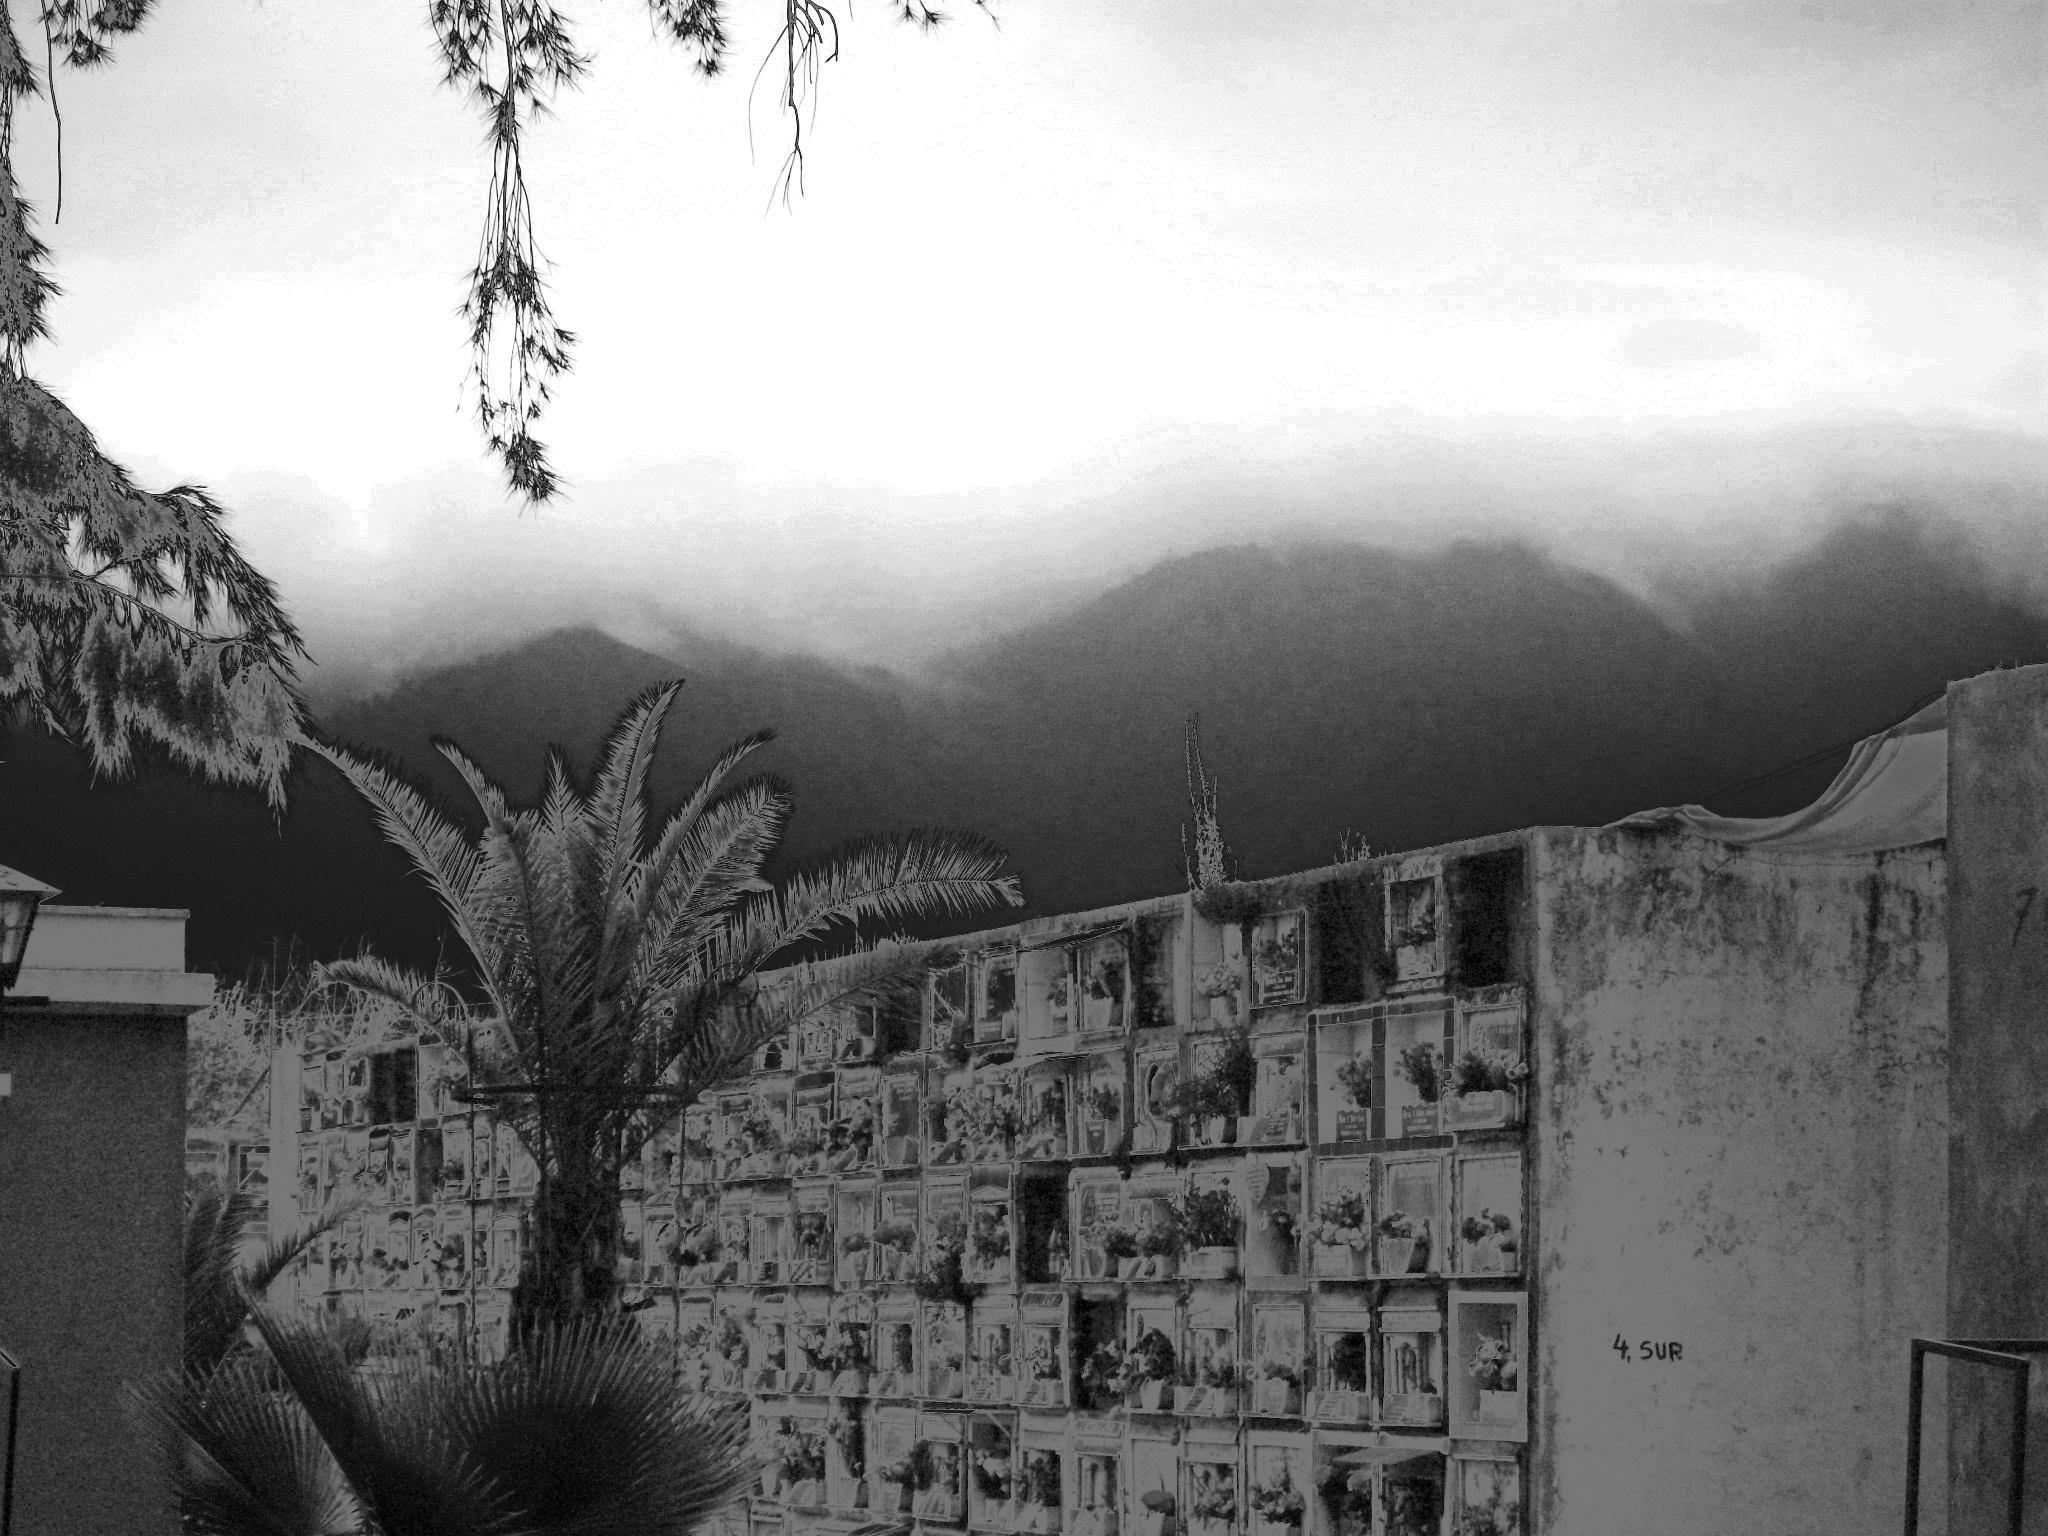 Cementerio San Fernando-Chile by humanfobia